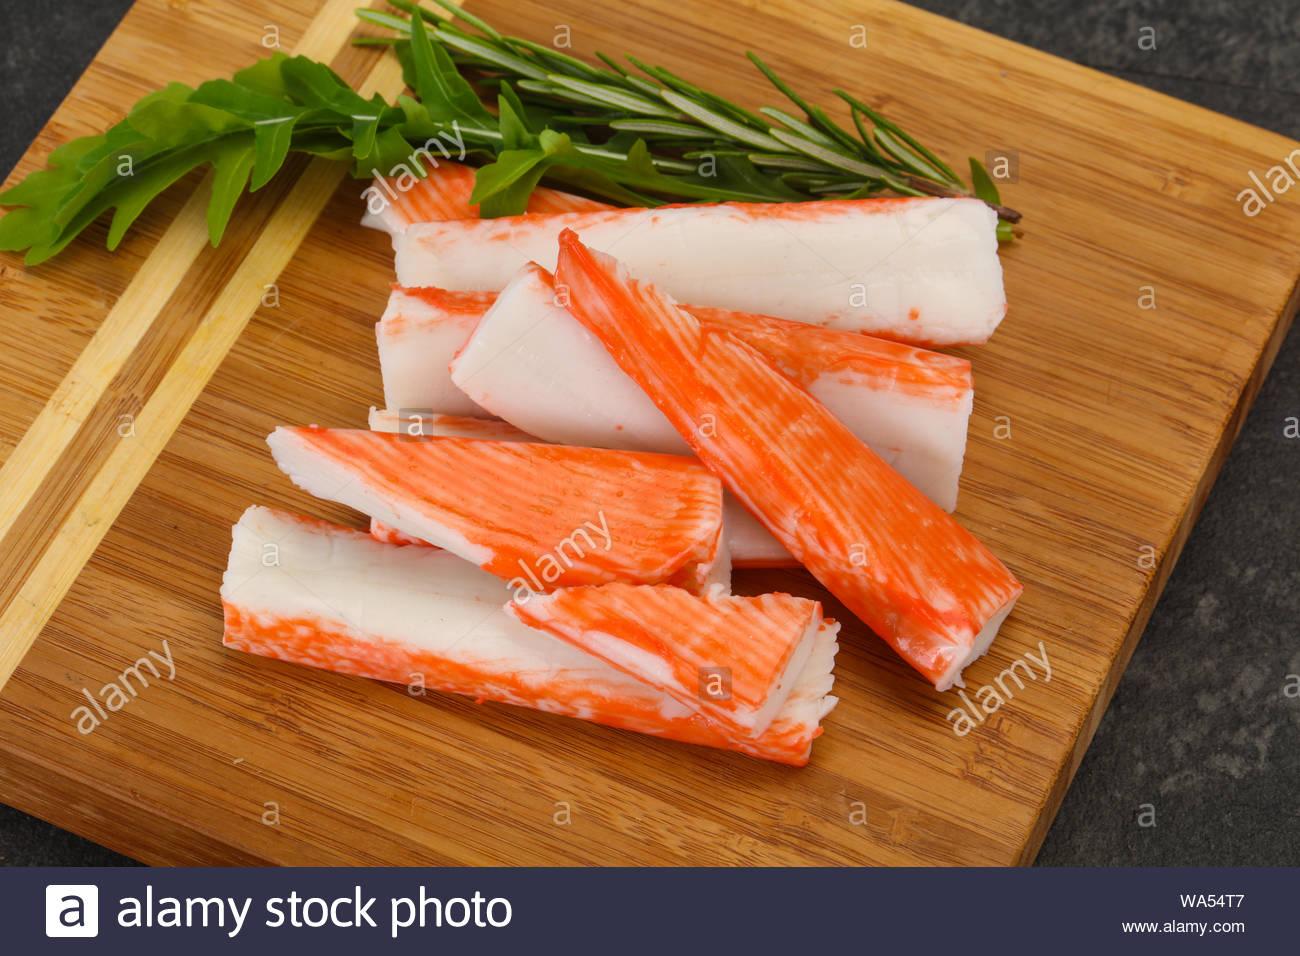 Crab stick surimi over wooden board Stock Photo - Alamy